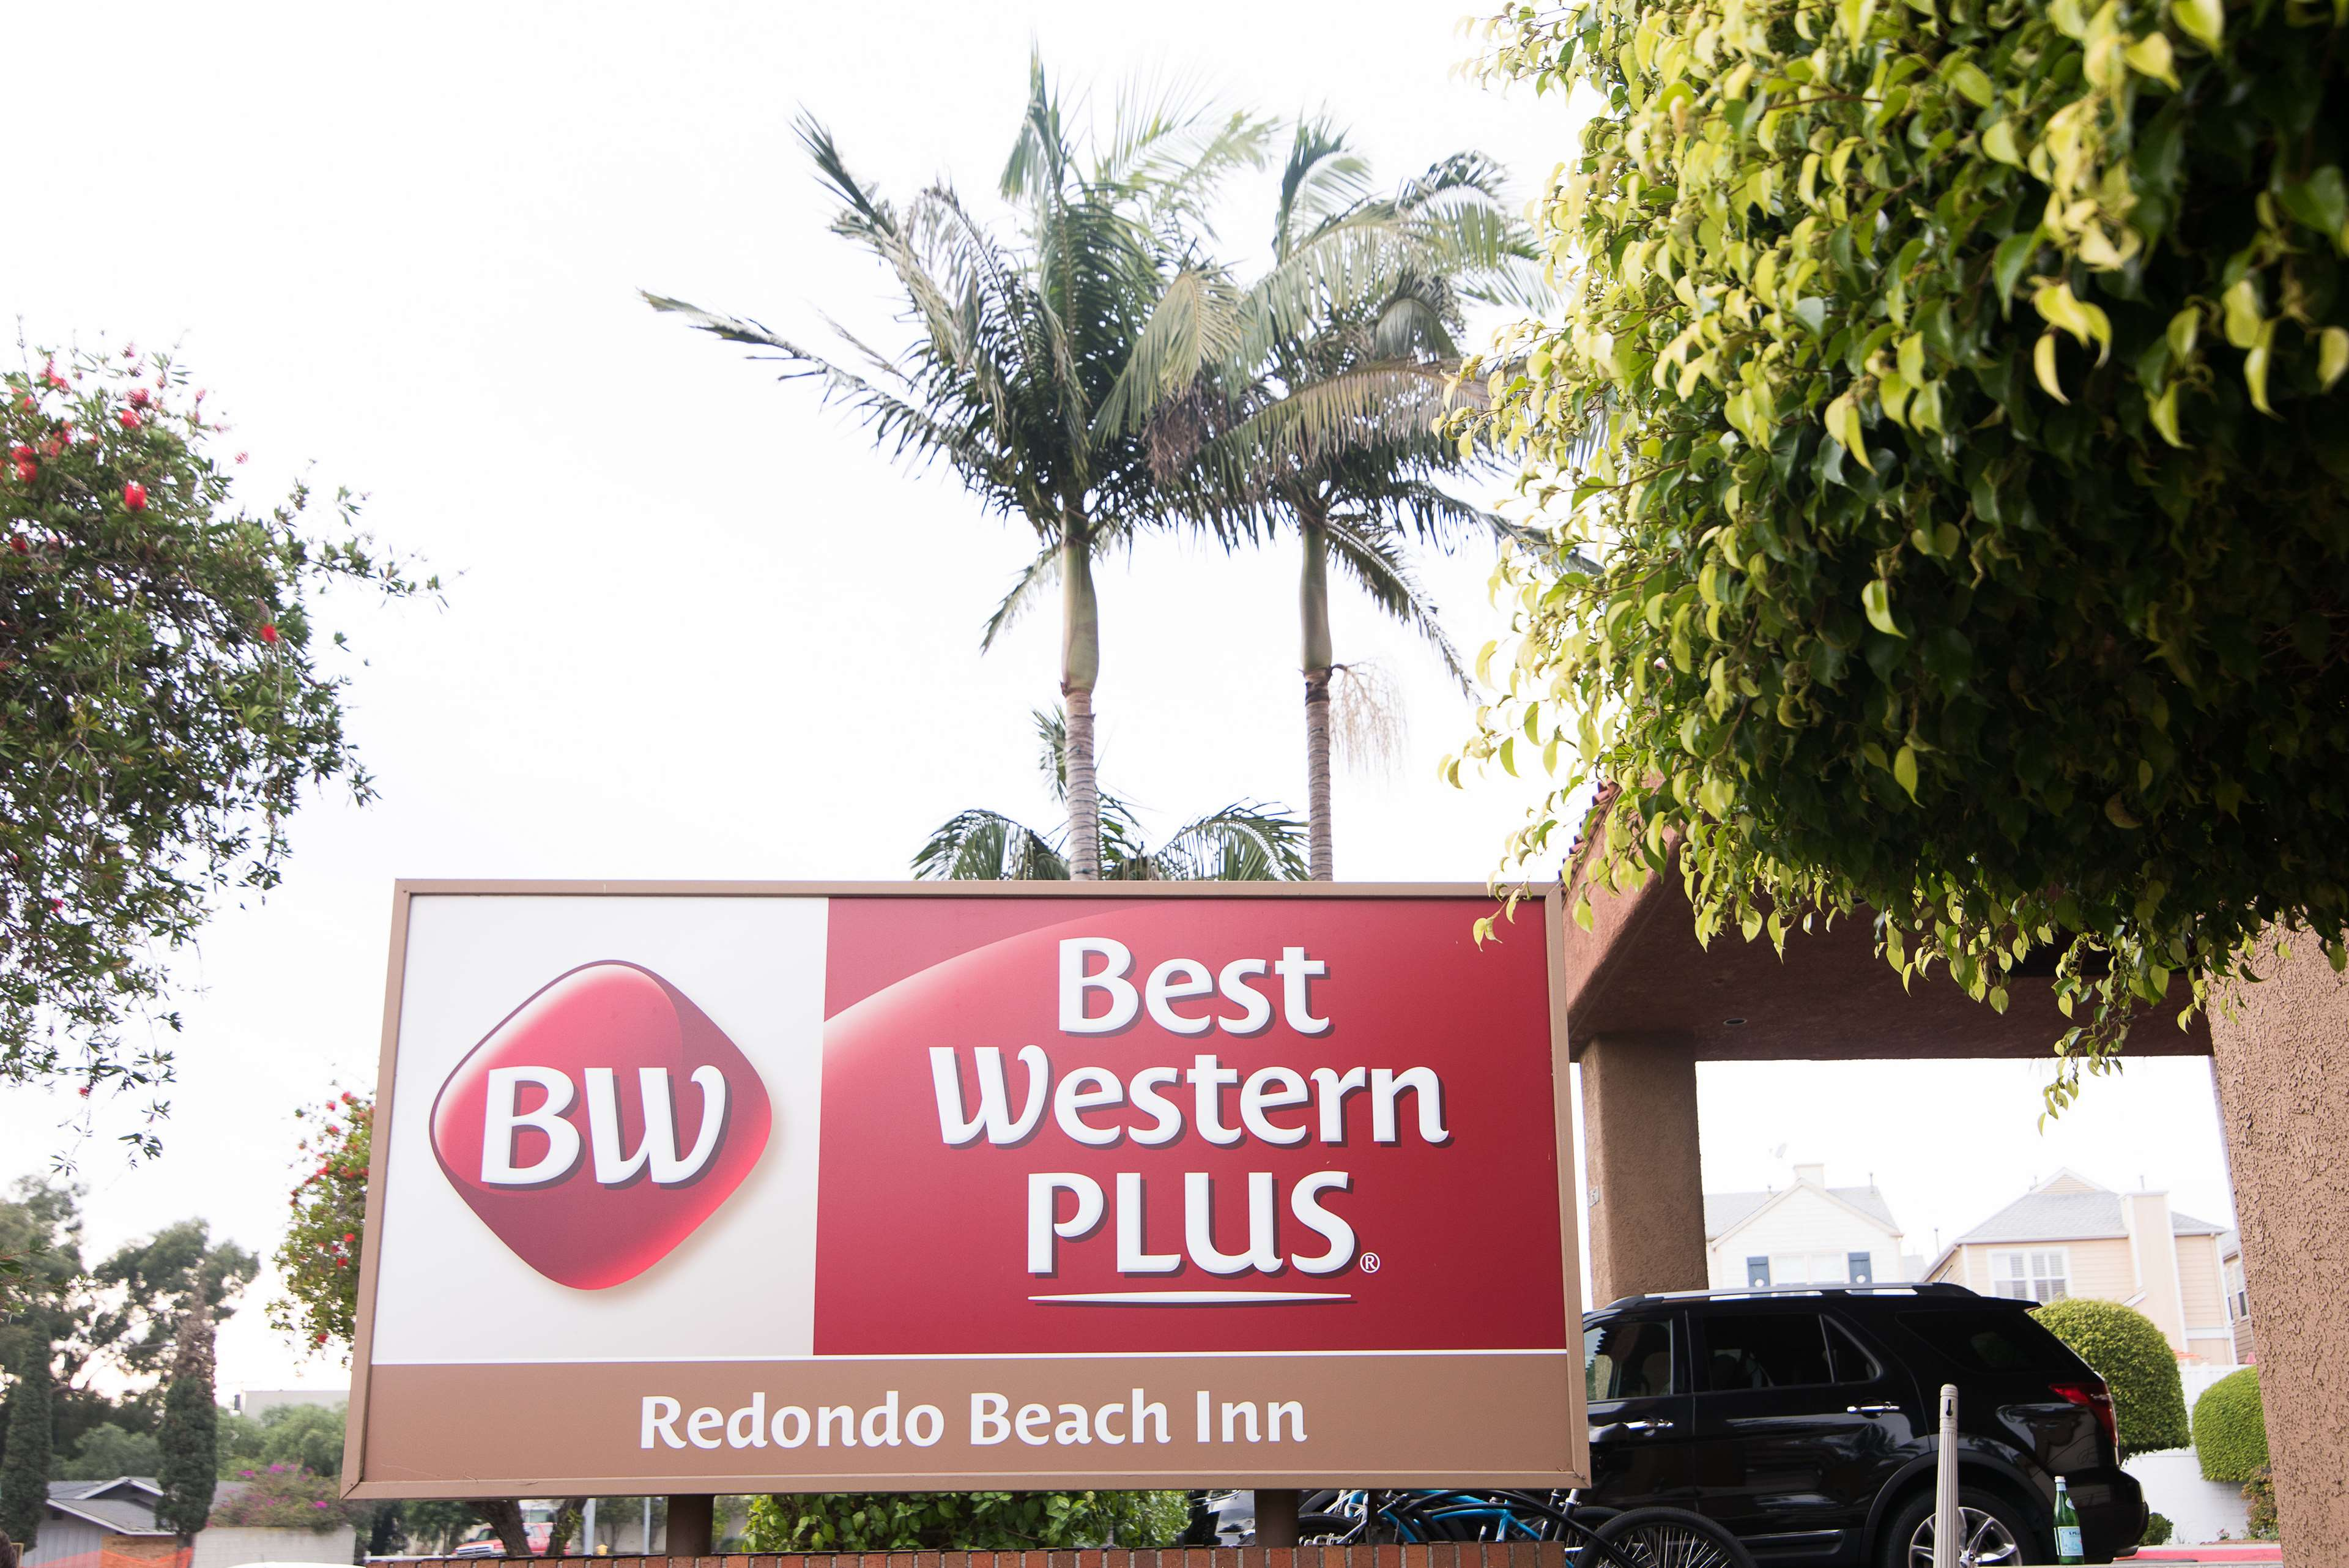 Best Western Plus Redondo Beach Inn image 1